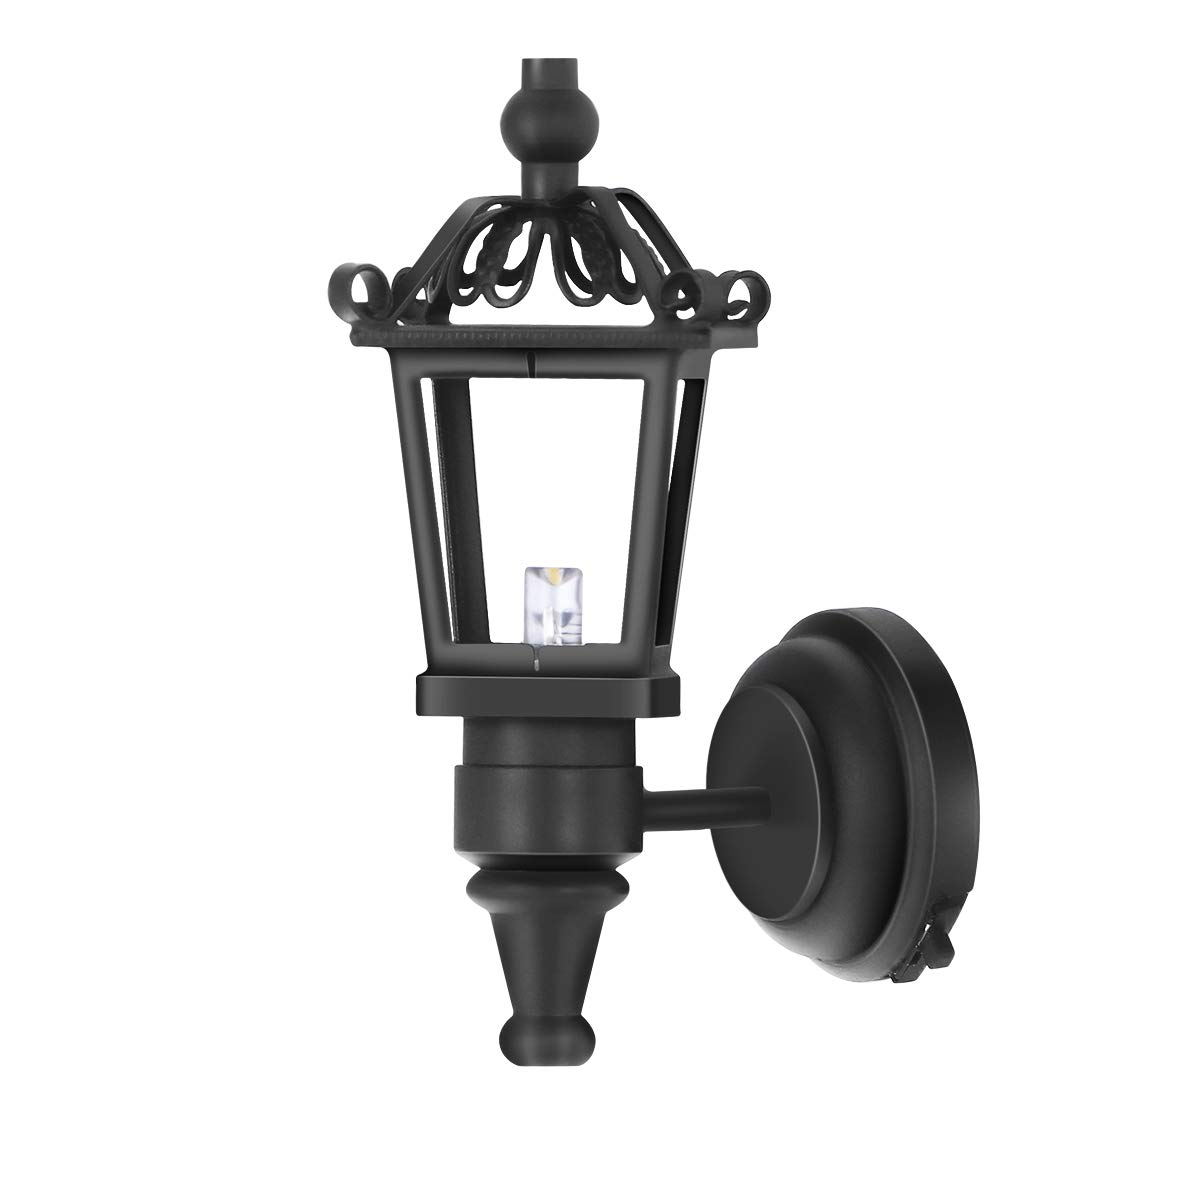 Leorx Vintage DIY Dollhouse 1 12 Dollhouse Miniature LED Wall Light Lamp (Black) by LEORX